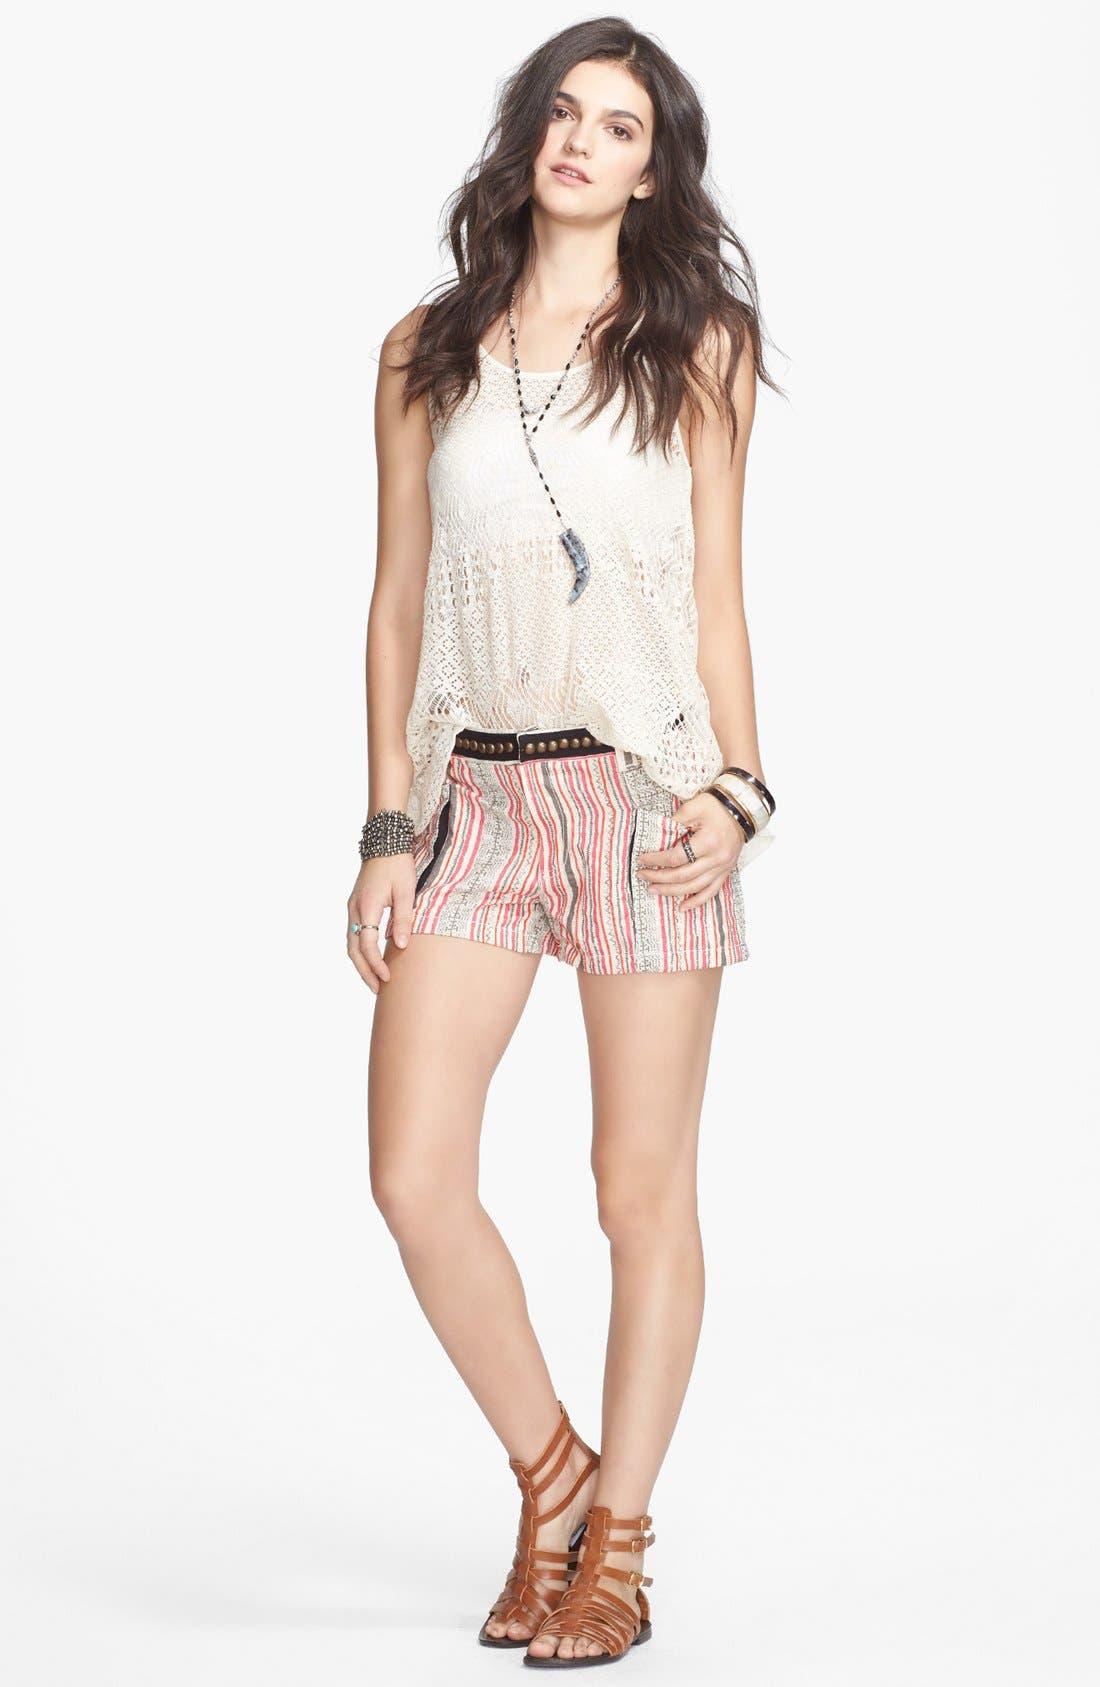 Main Image - Free People 'Lolas' Lace-Up Mixed Knit Tank